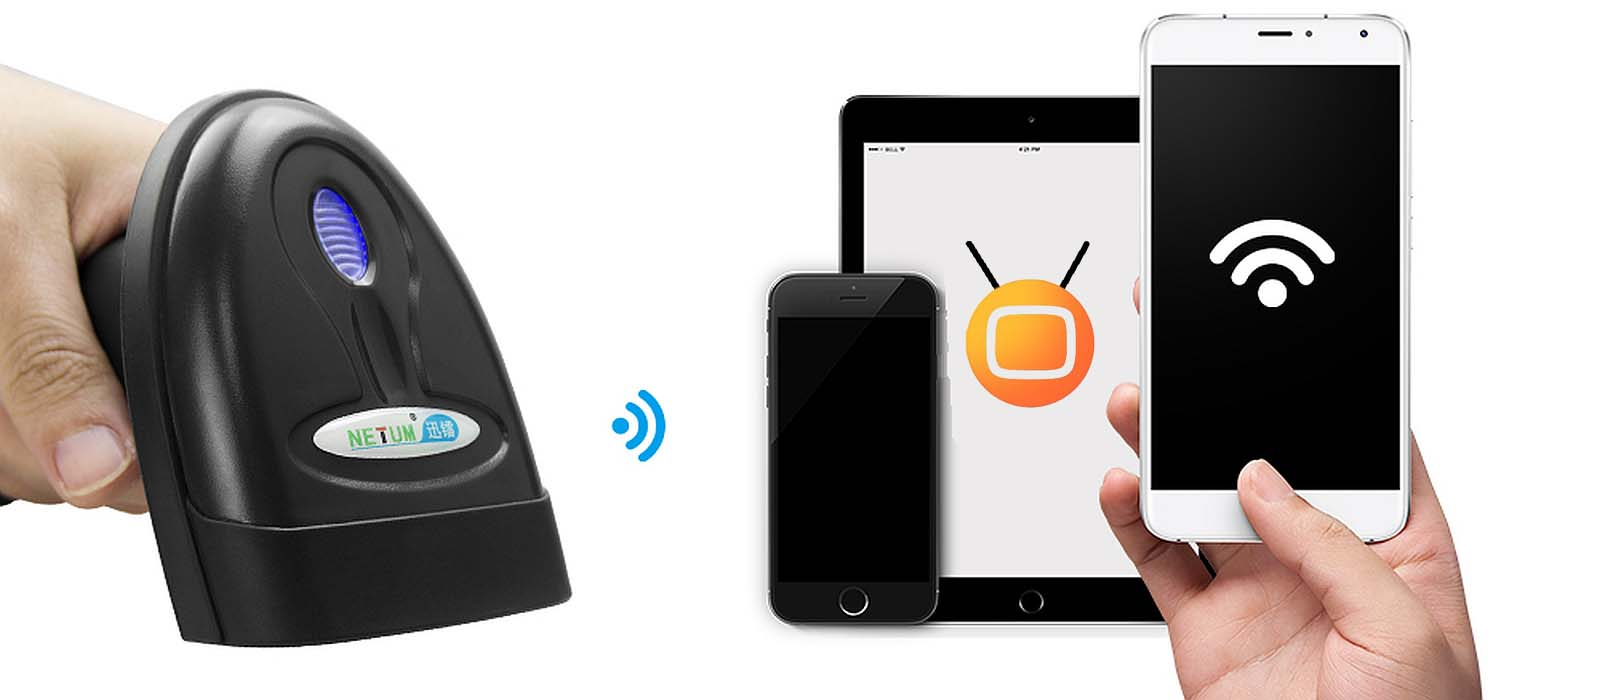 Netum Bluetooth Scanners